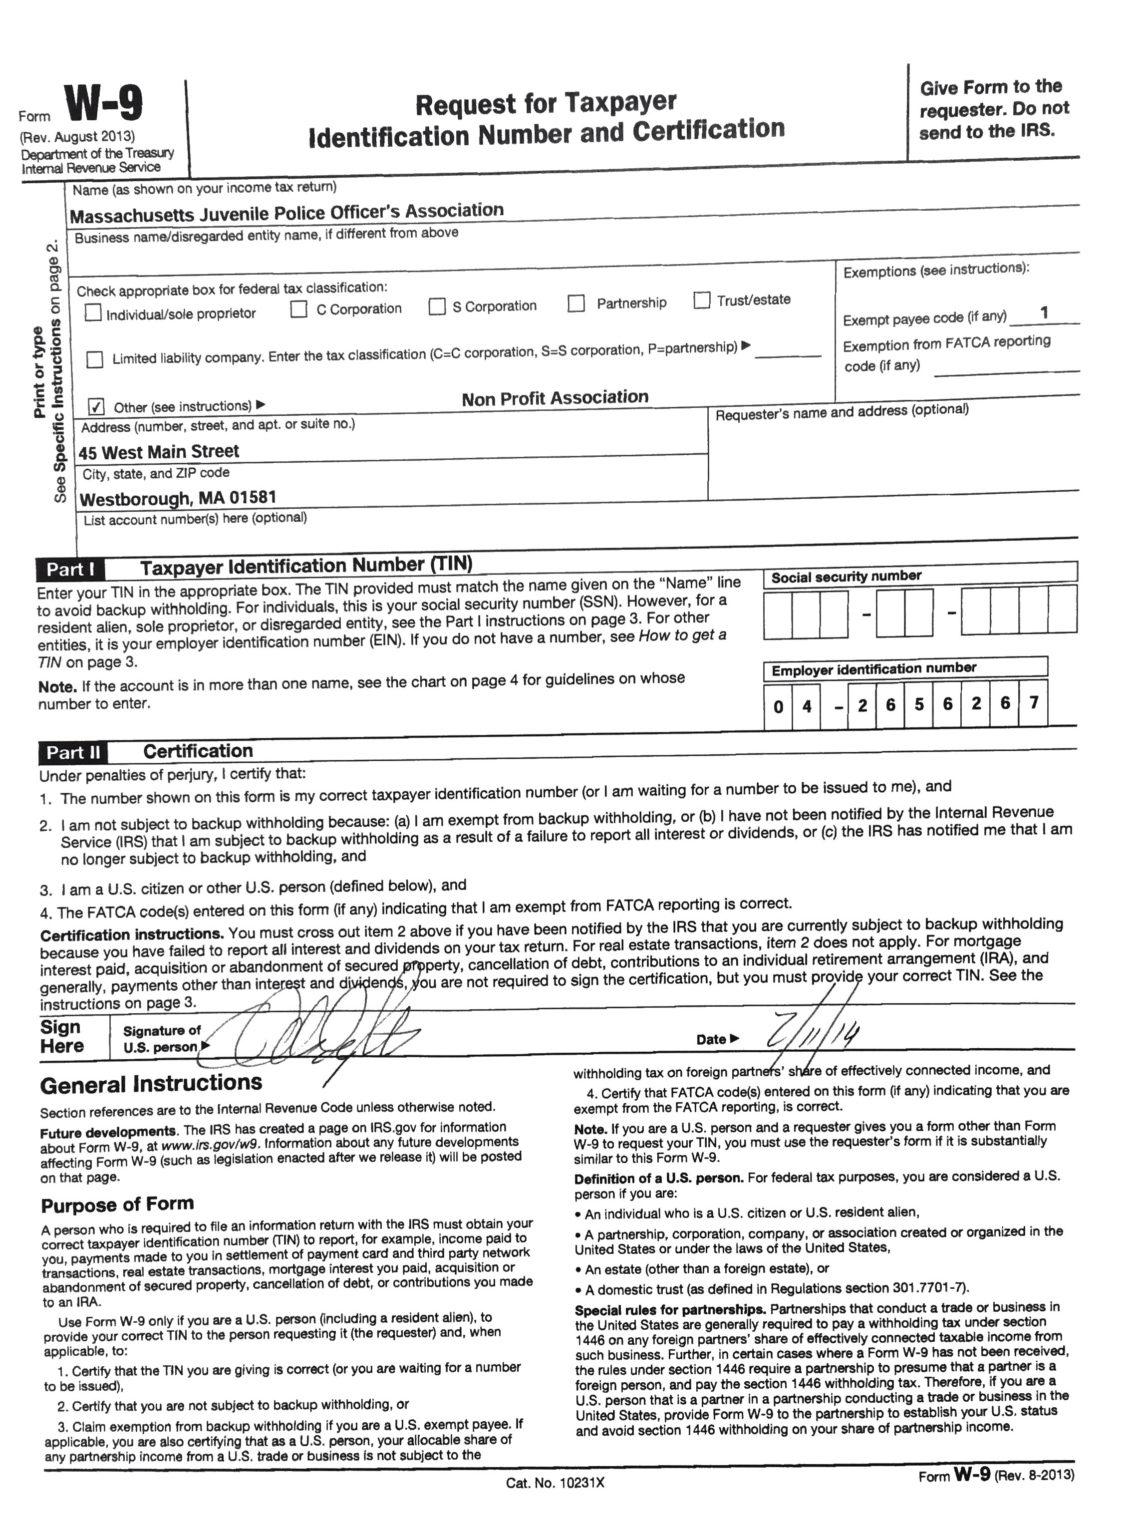 I 9 Form 2017 Printable - Prnt | I9 Form 2021 Printable pertaining to I9 Forms 2021 Printable